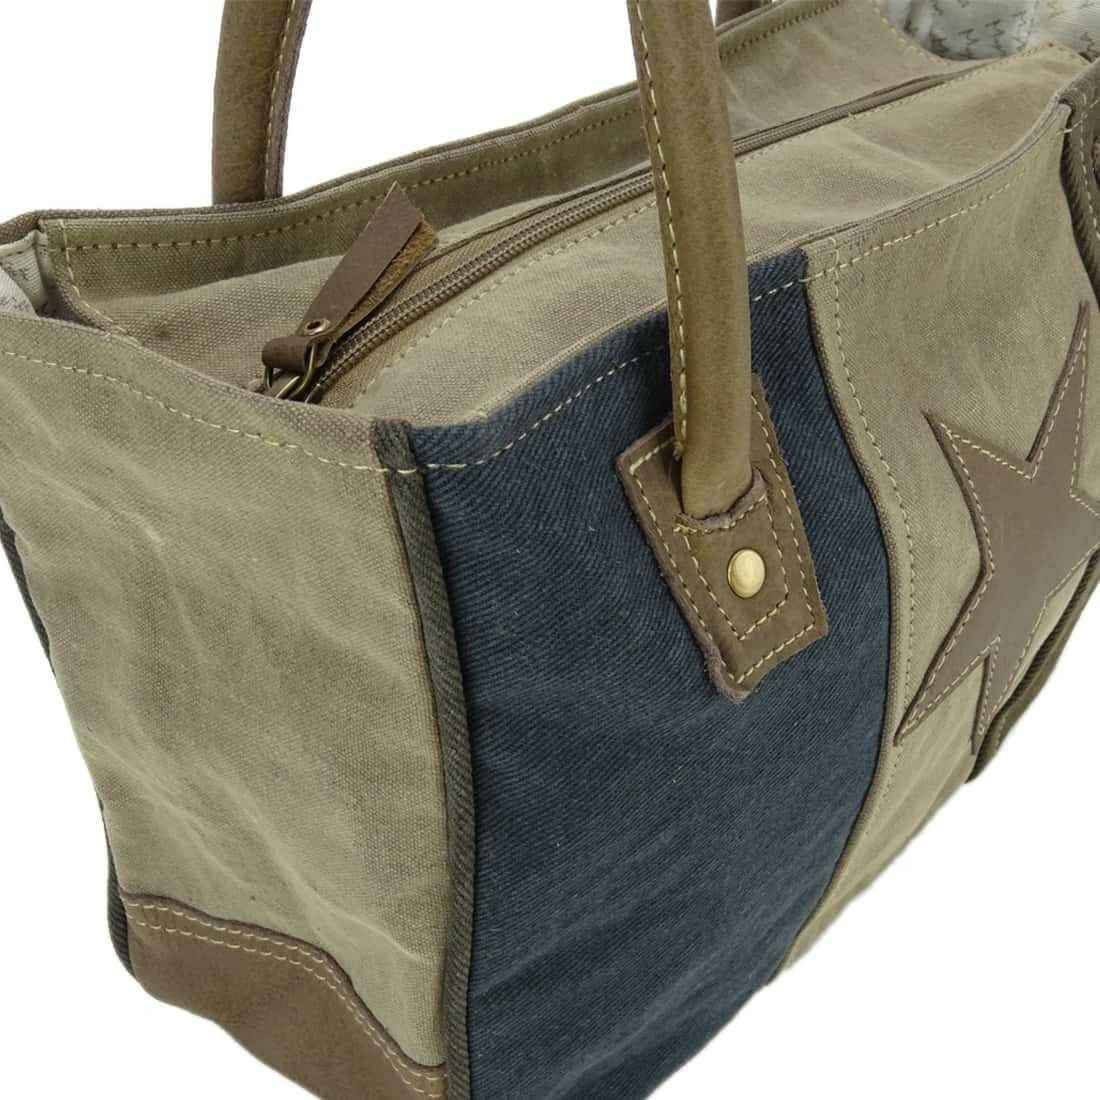 Myra Bag Handtas Stella detail3